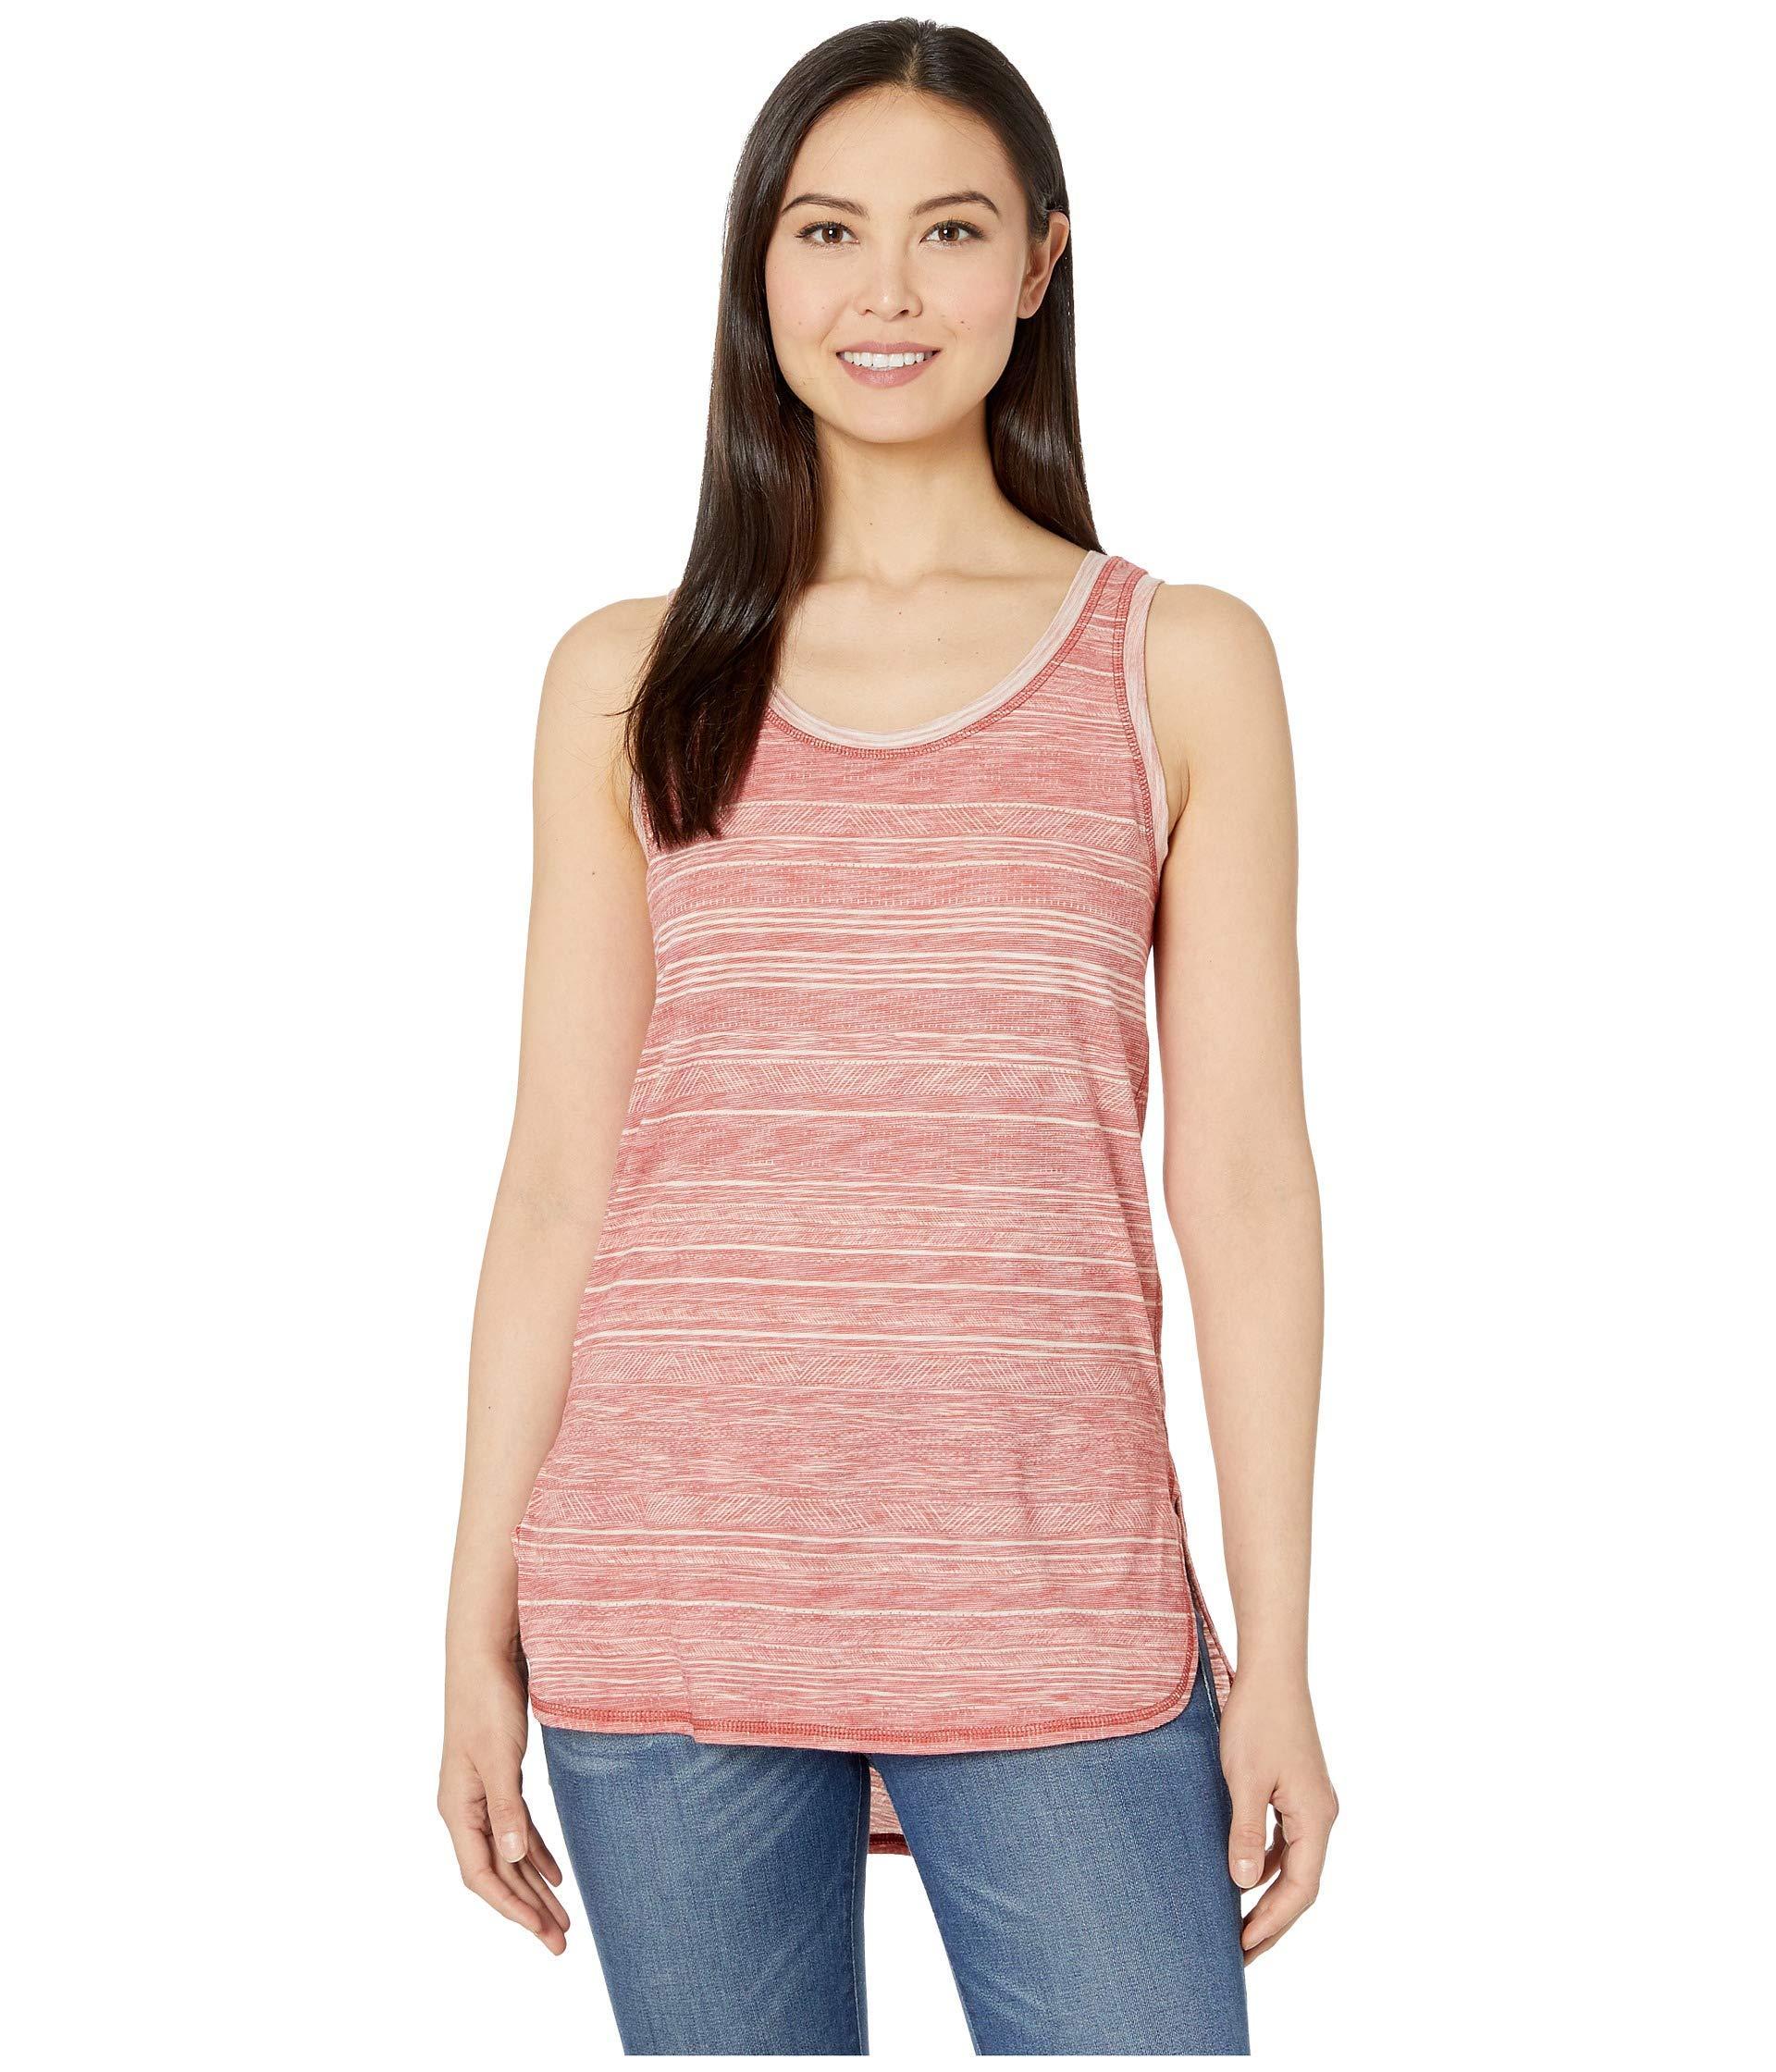 4b38f841fe266 Lyst - Prana Kiely Tunic (aloe Sand Dune) Women's Sleeveless in Pink